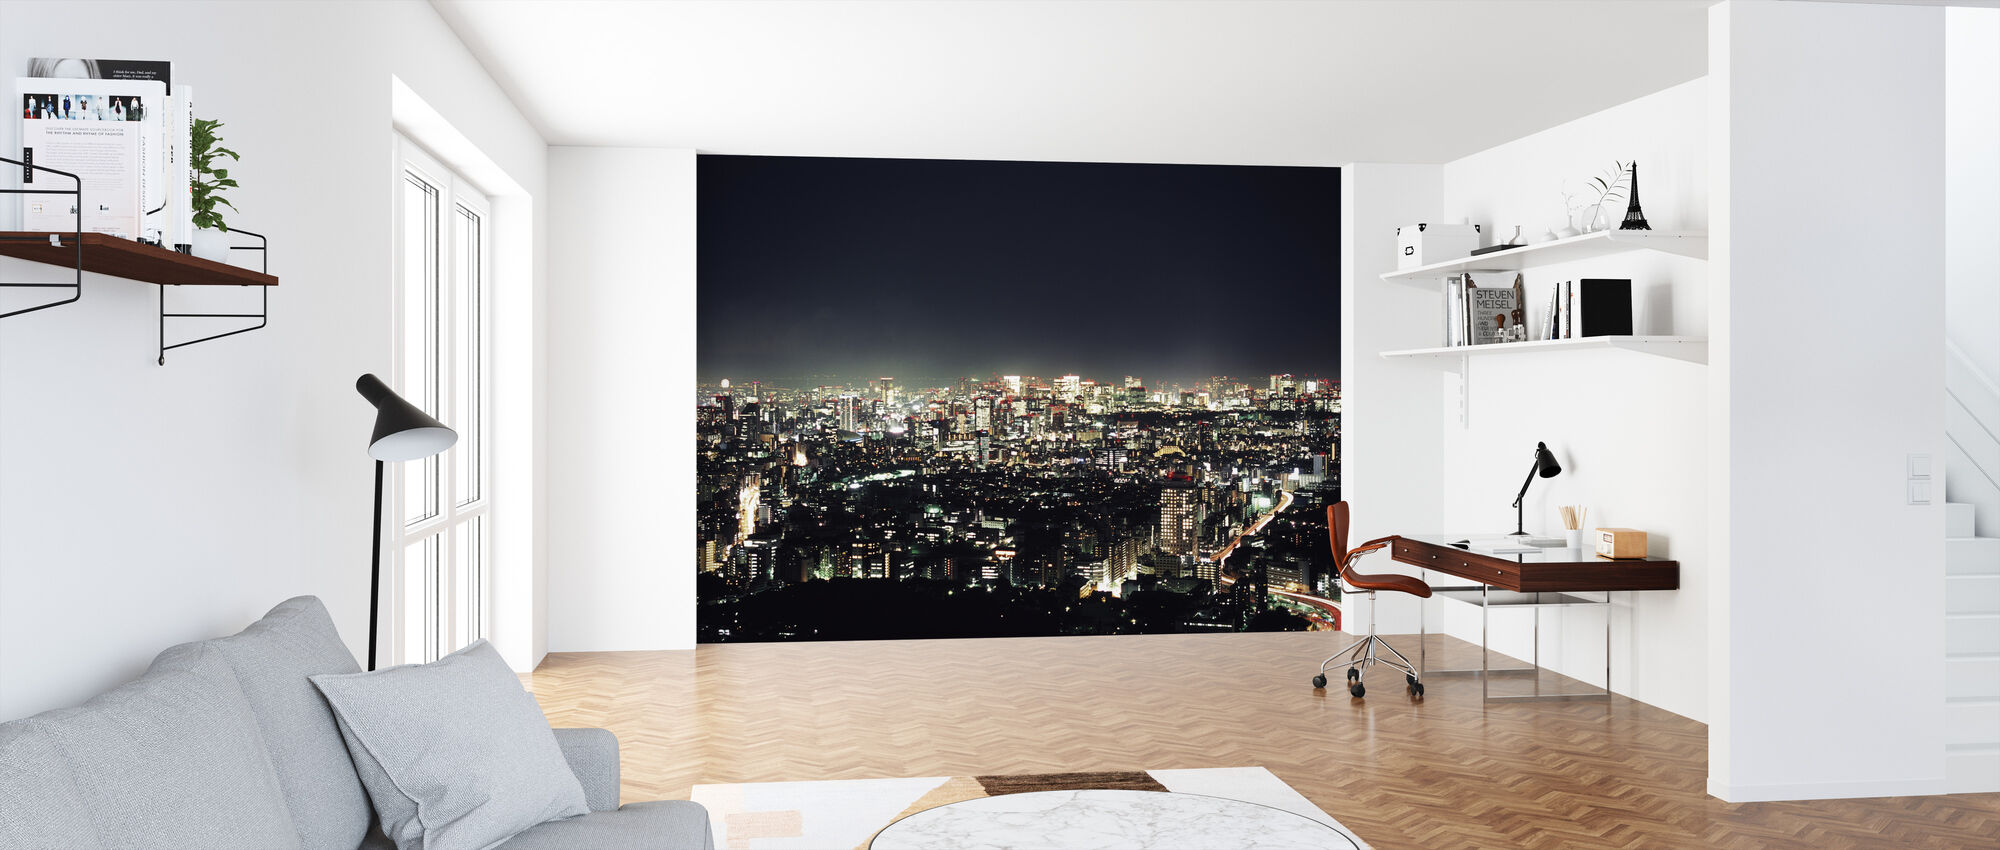 Tokyo by Night - Wallpaper - Office